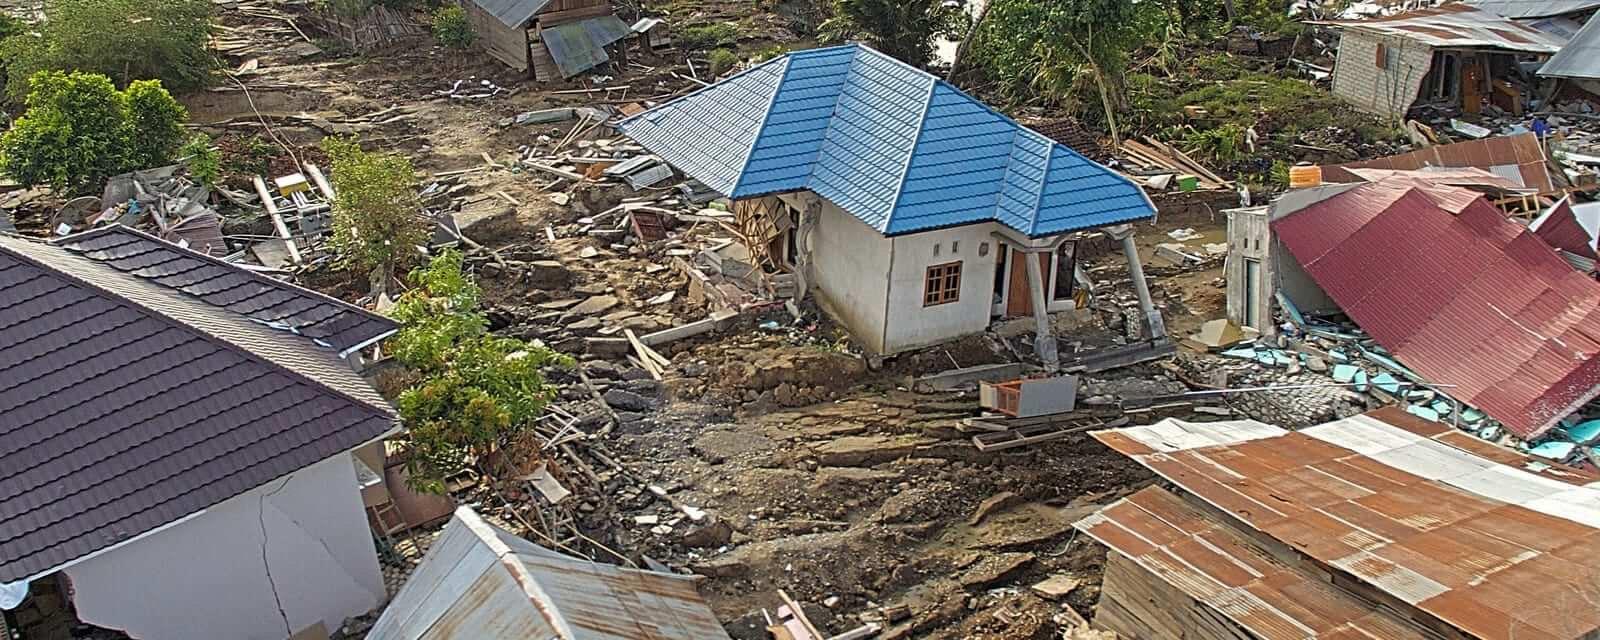 Drone Photo at Palu Sulawesi Indonesia after the Tsunami and Earthquake